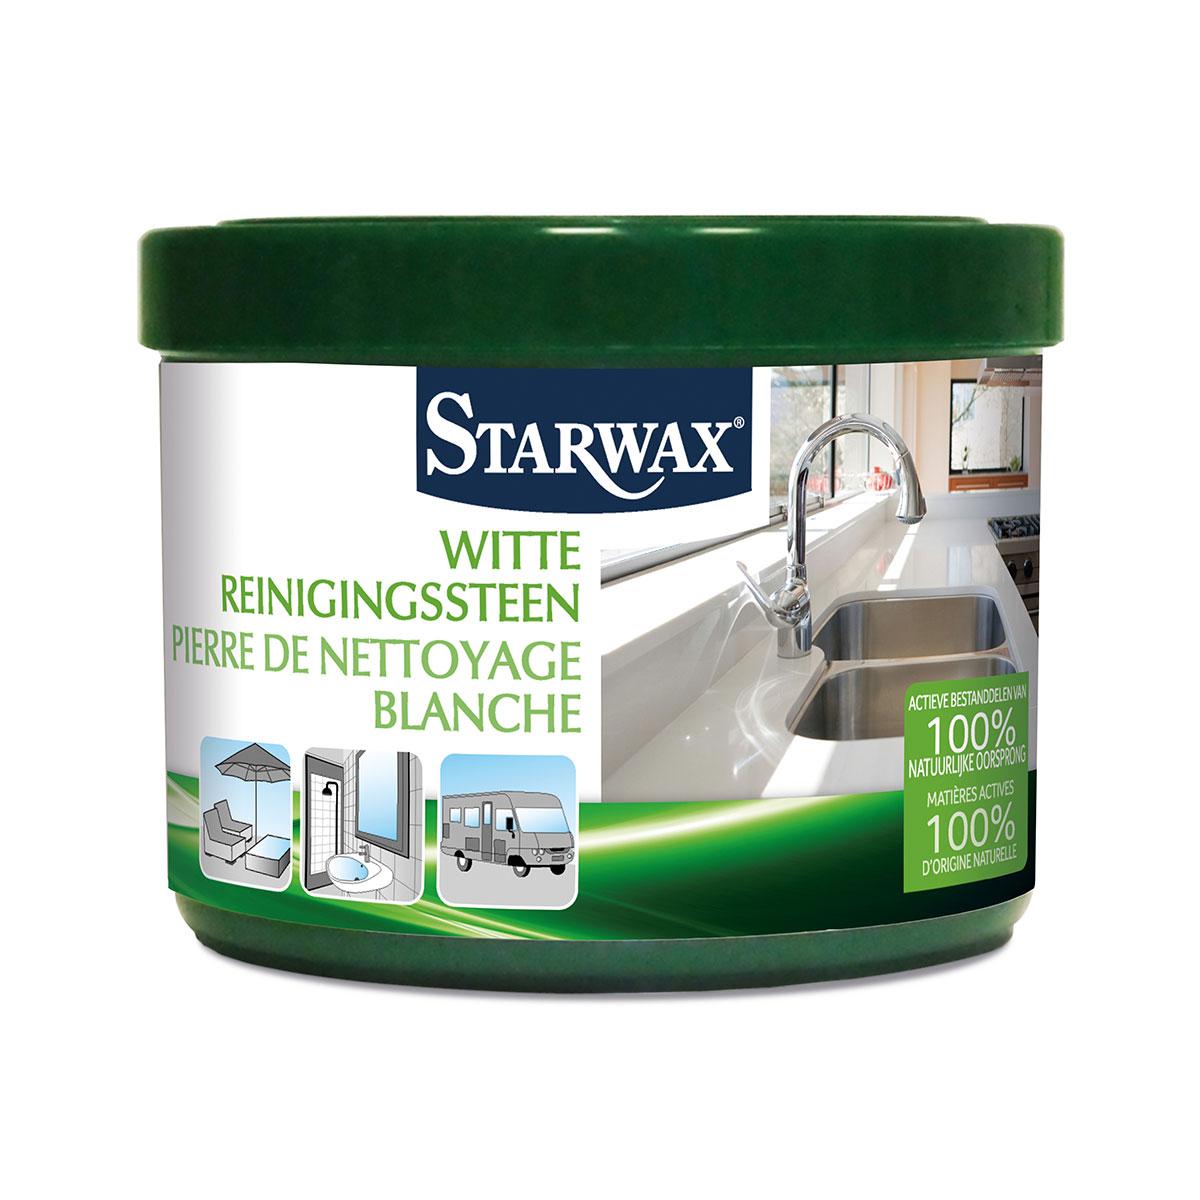 Reinigingssteen - Starwax